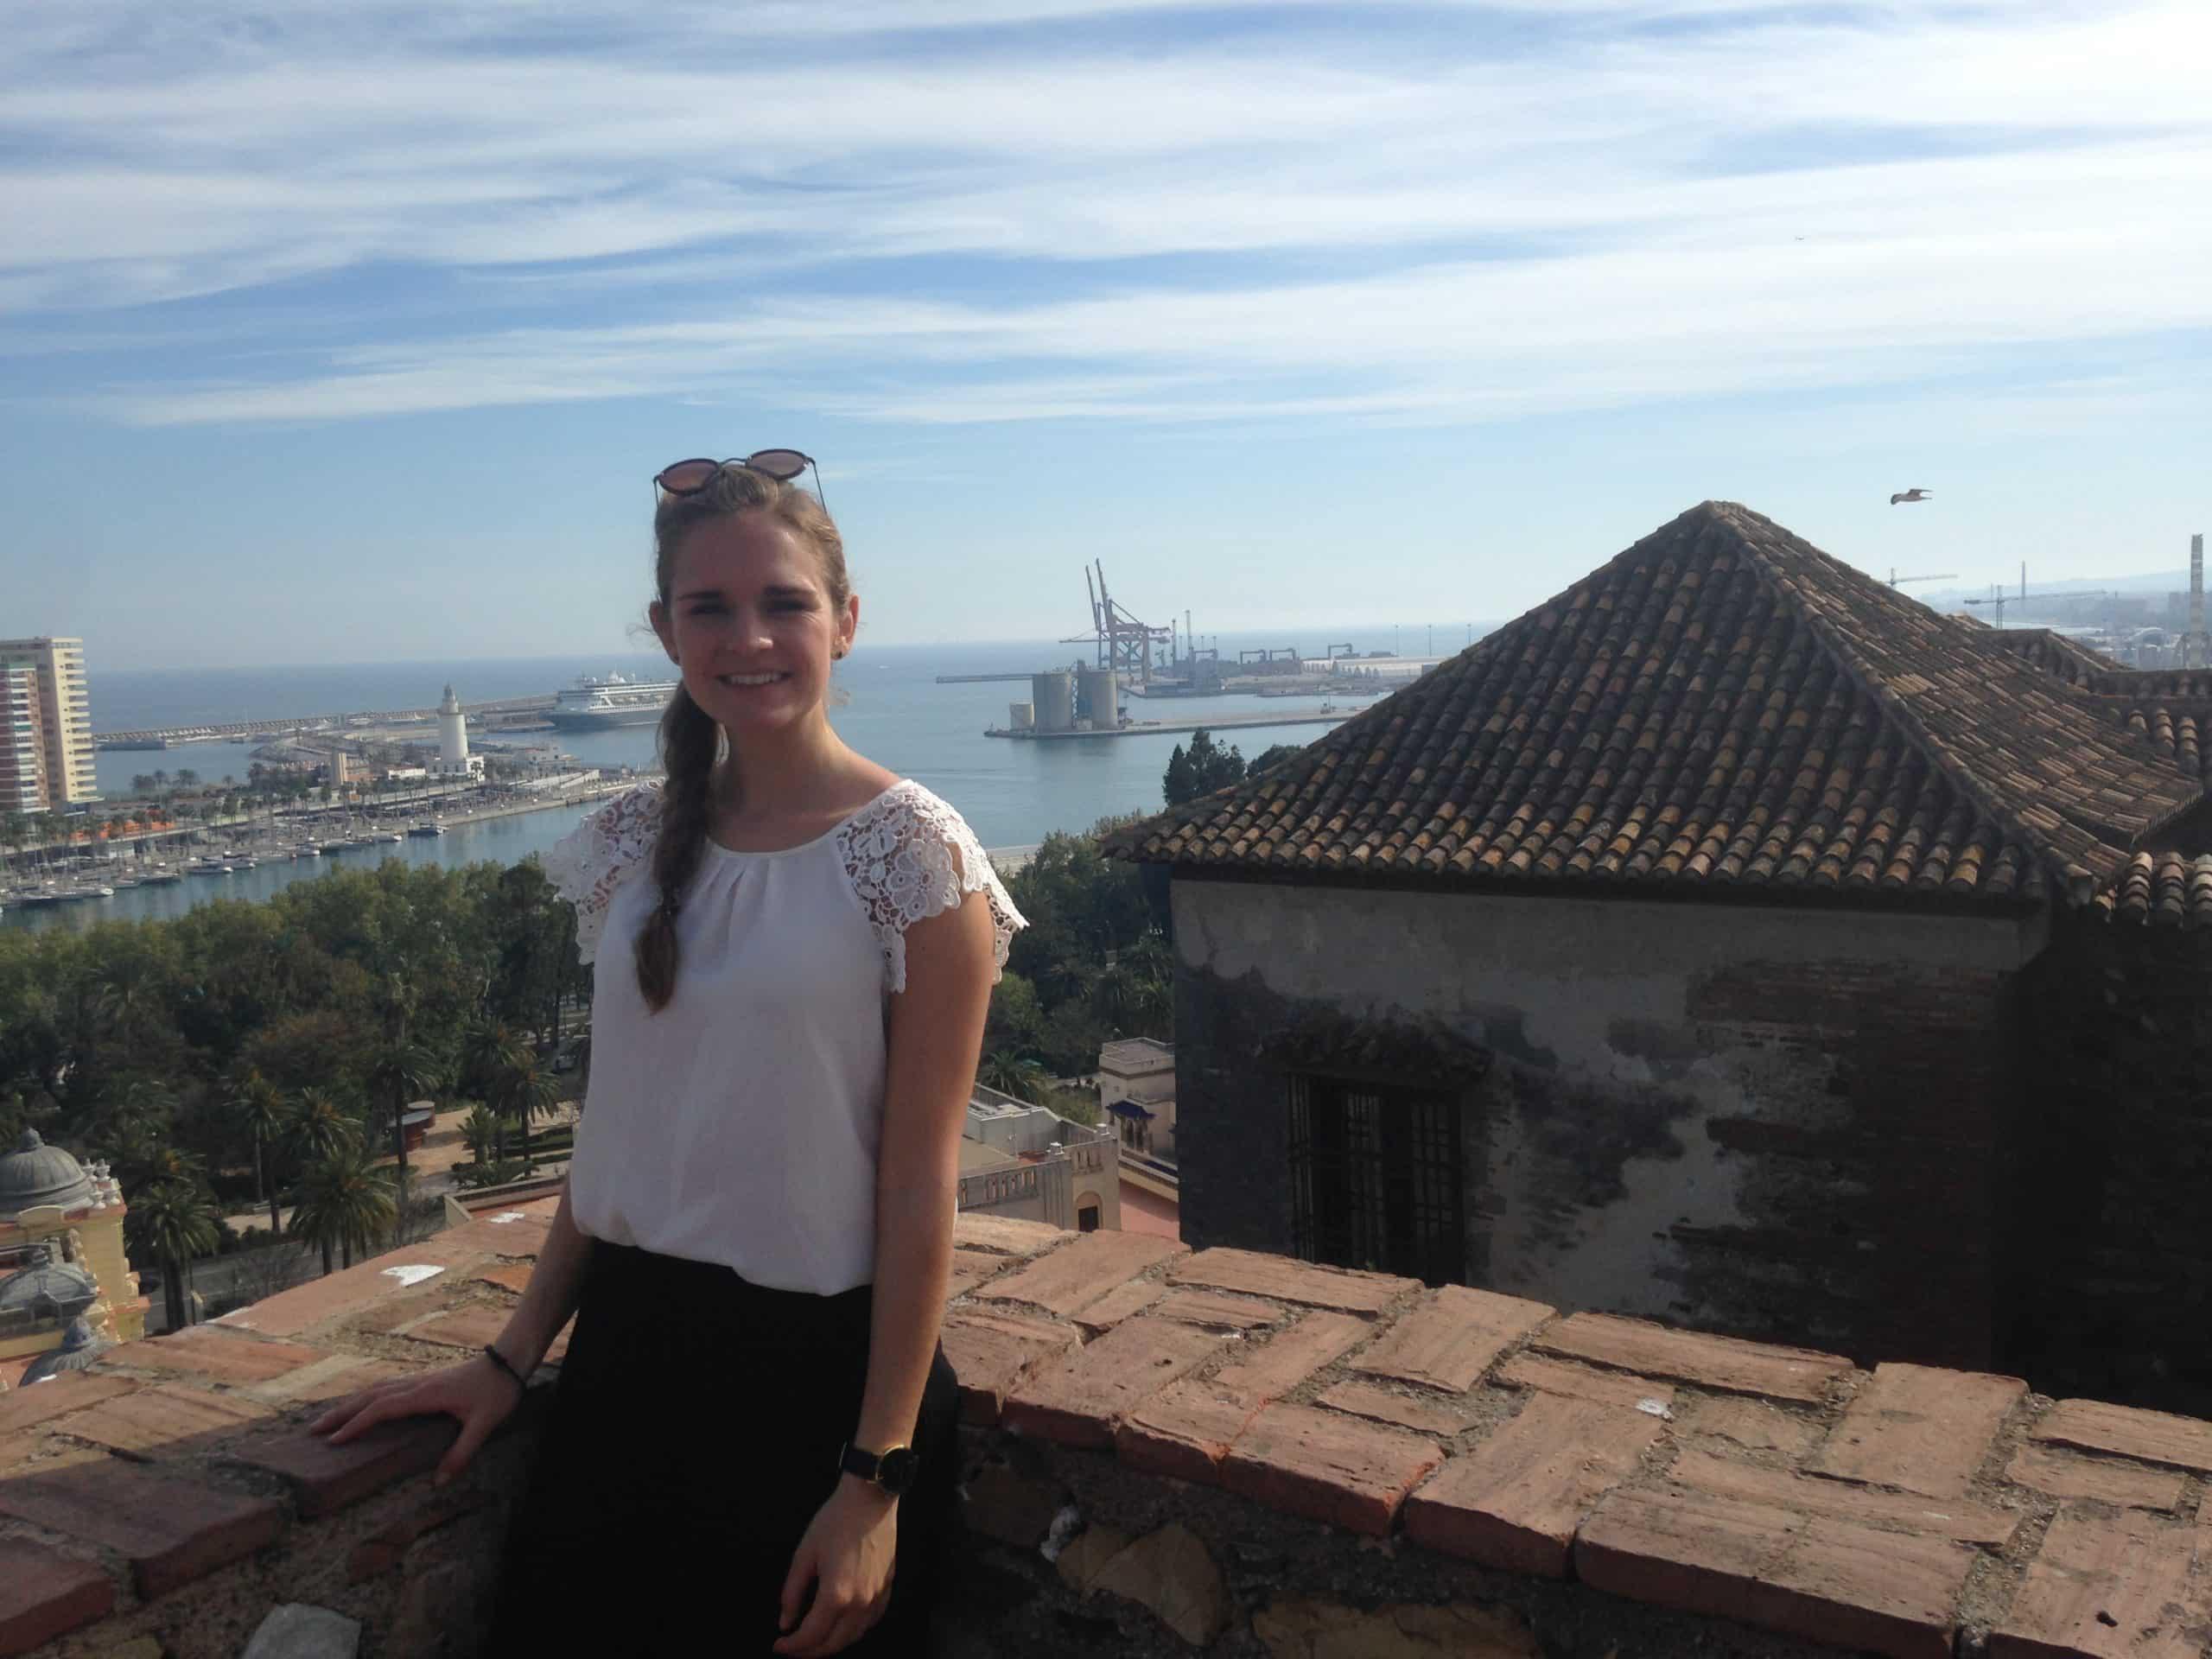 málaga tipps-spanien-reiseblog-reisetipps